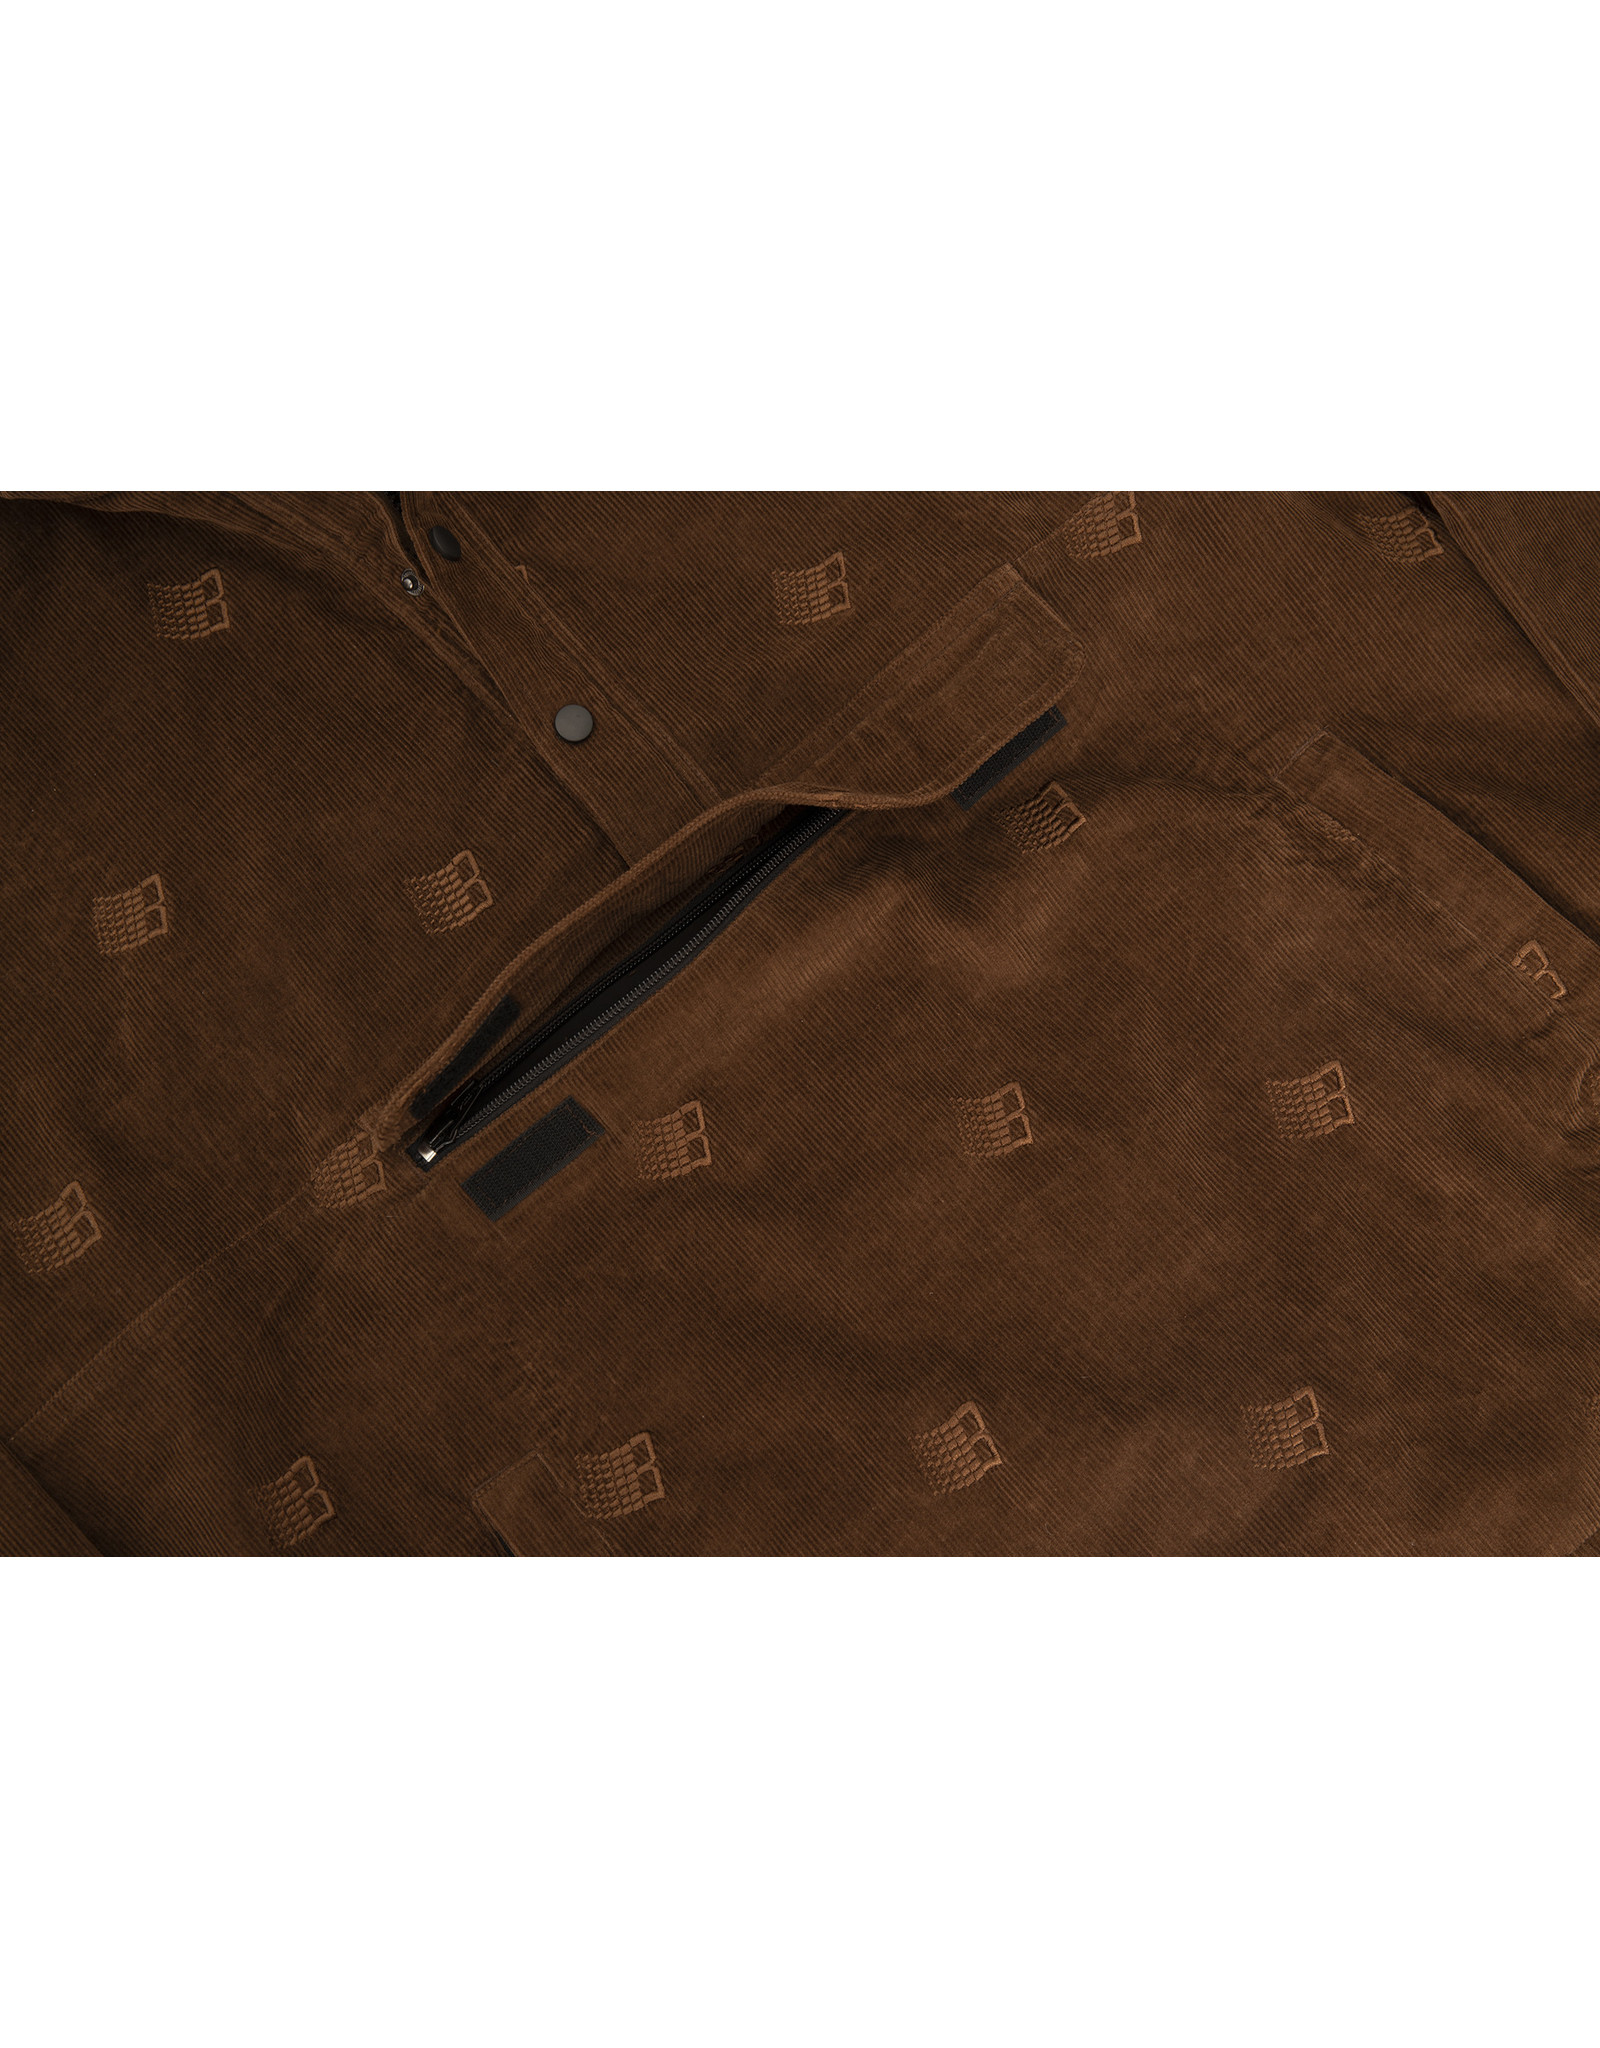 Bronze56K Allover Embroidered Anorak - Brown